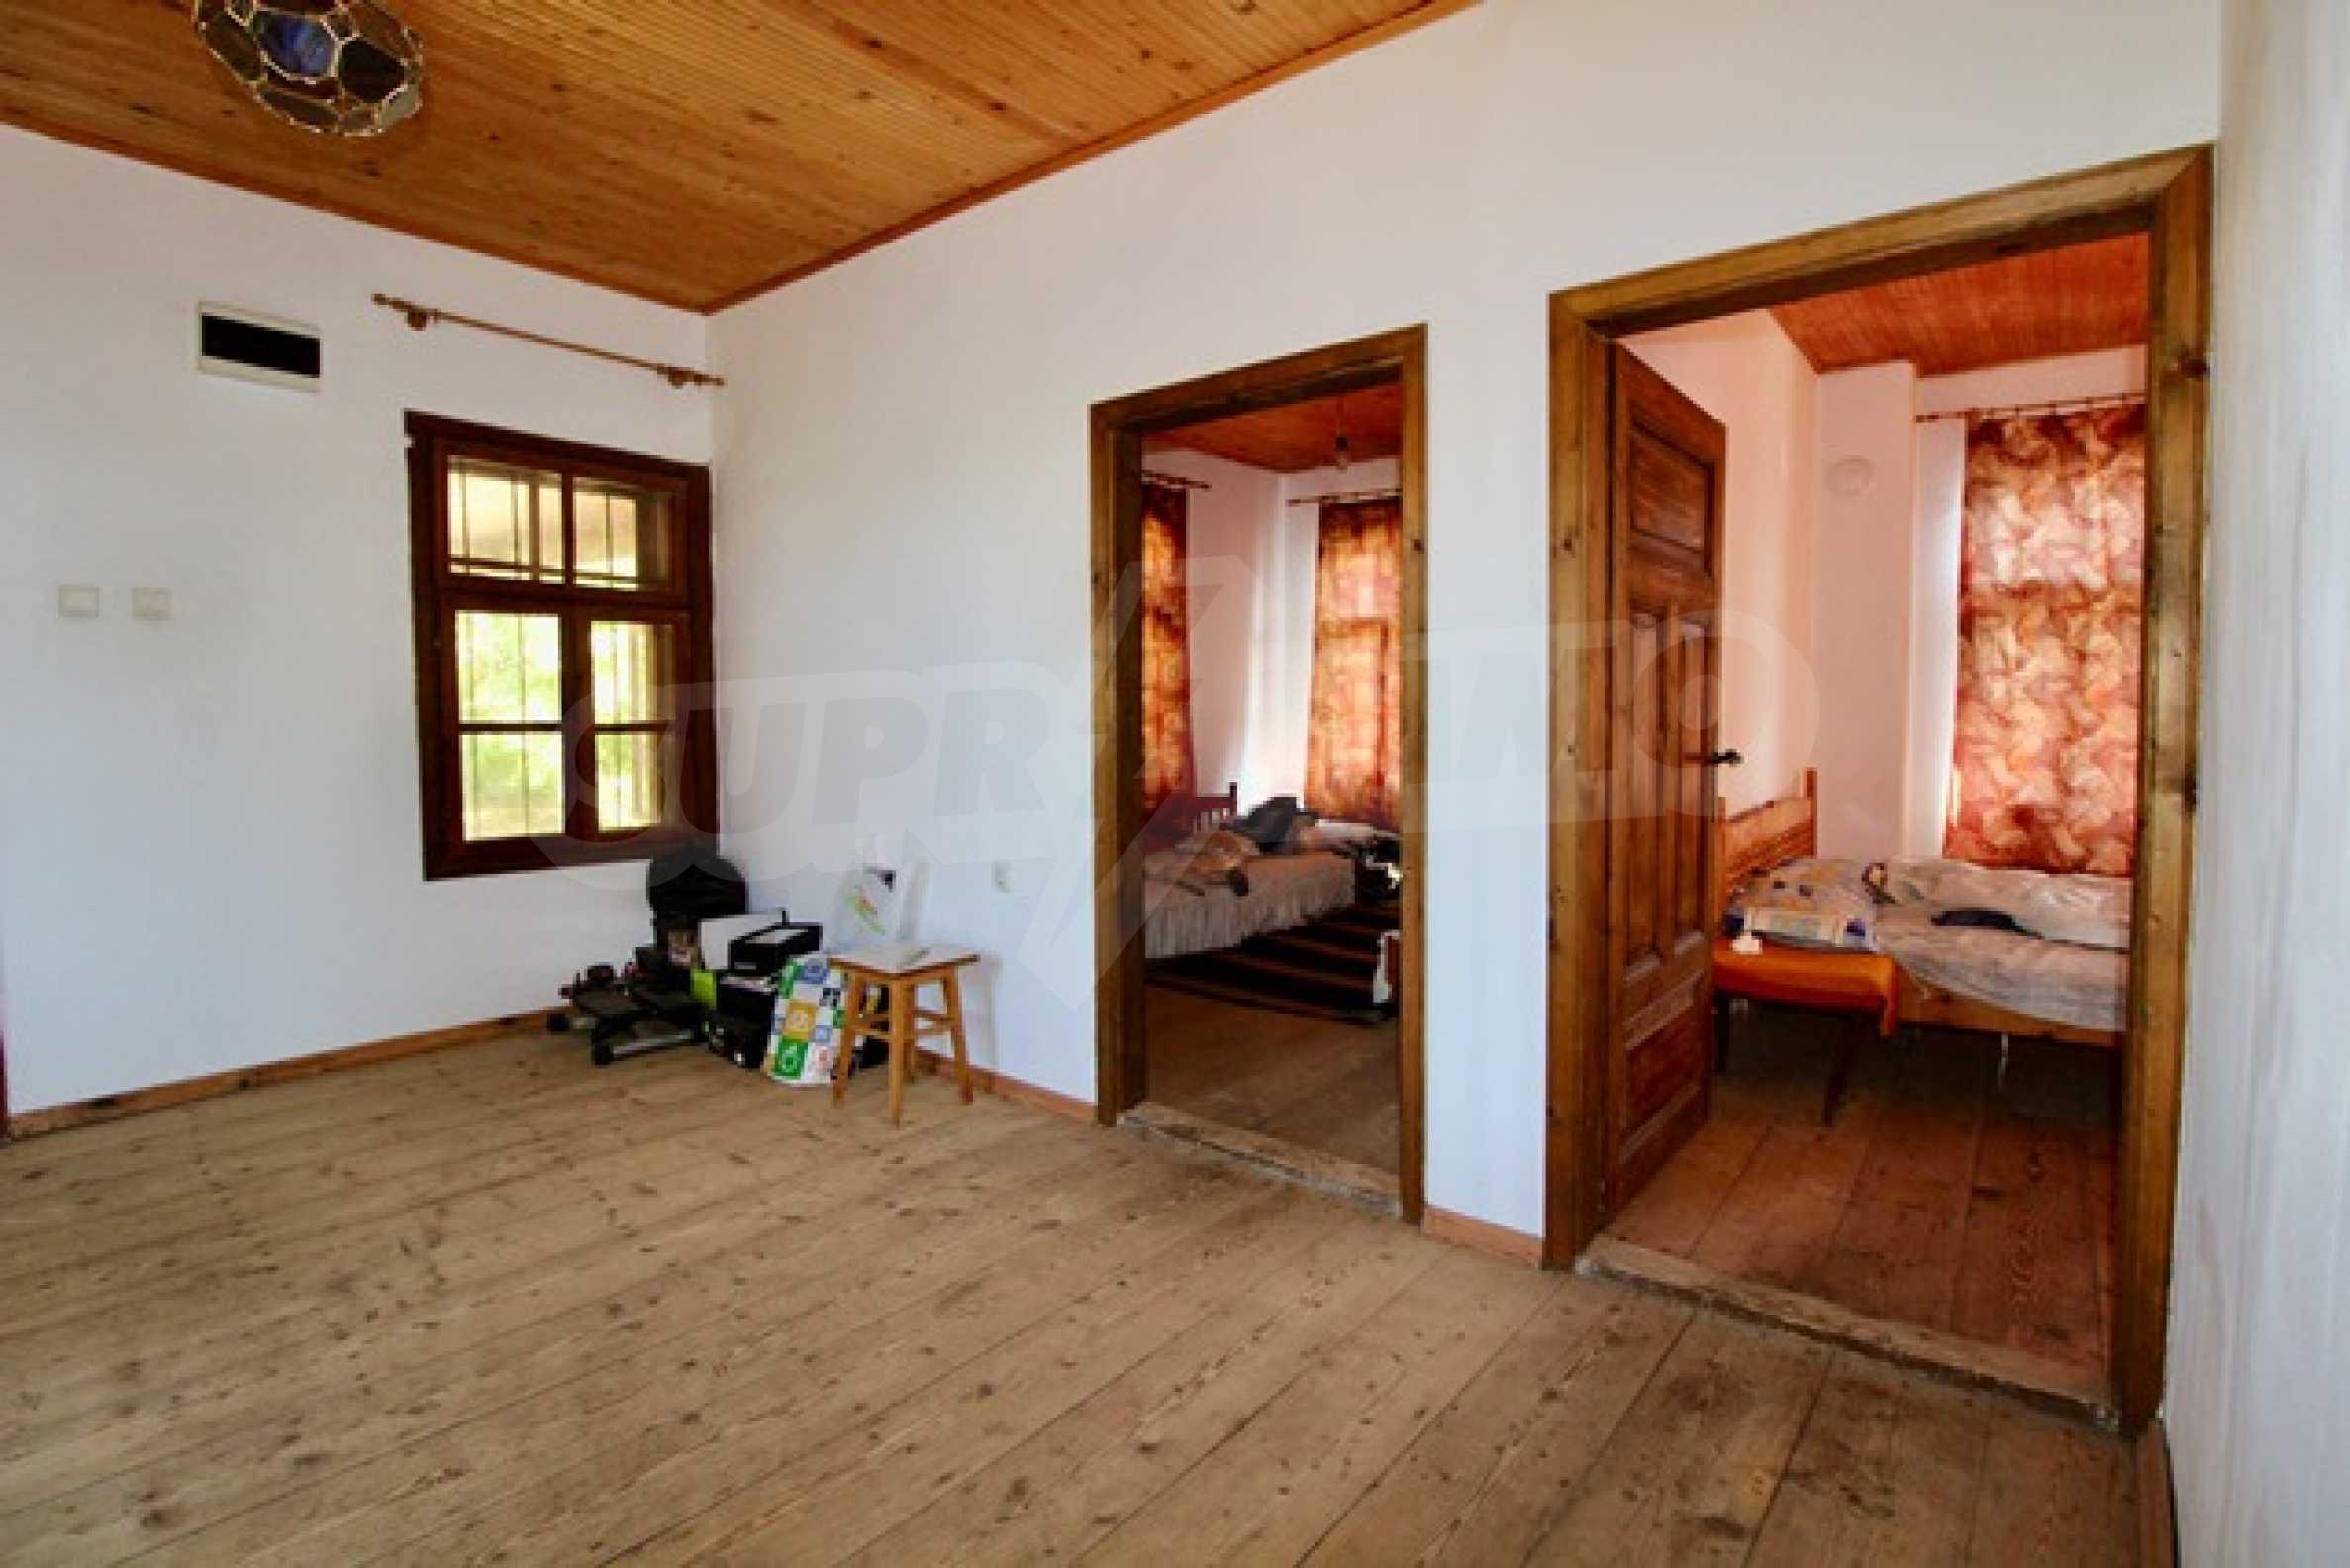 Lovely old house just 17 km away from Veliko Tarnovo 13